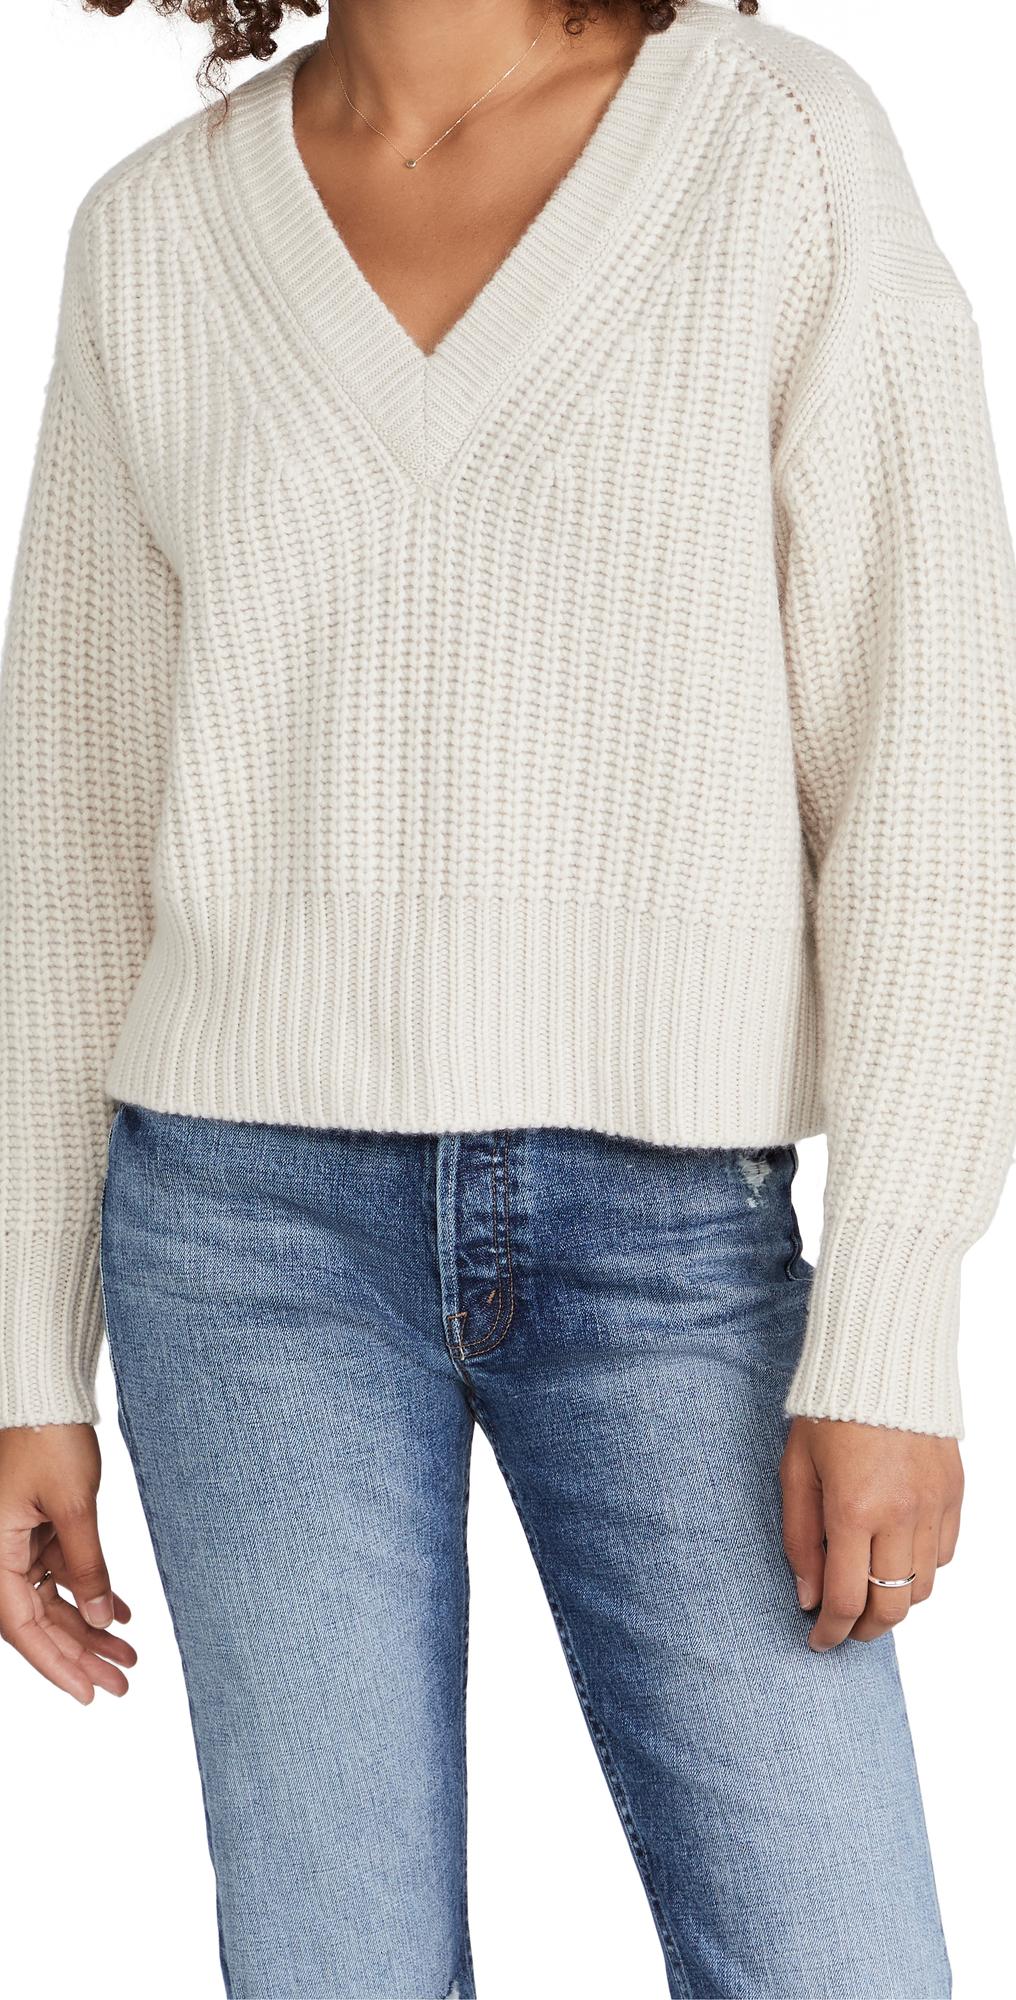 Chunky Shaker V Sweater